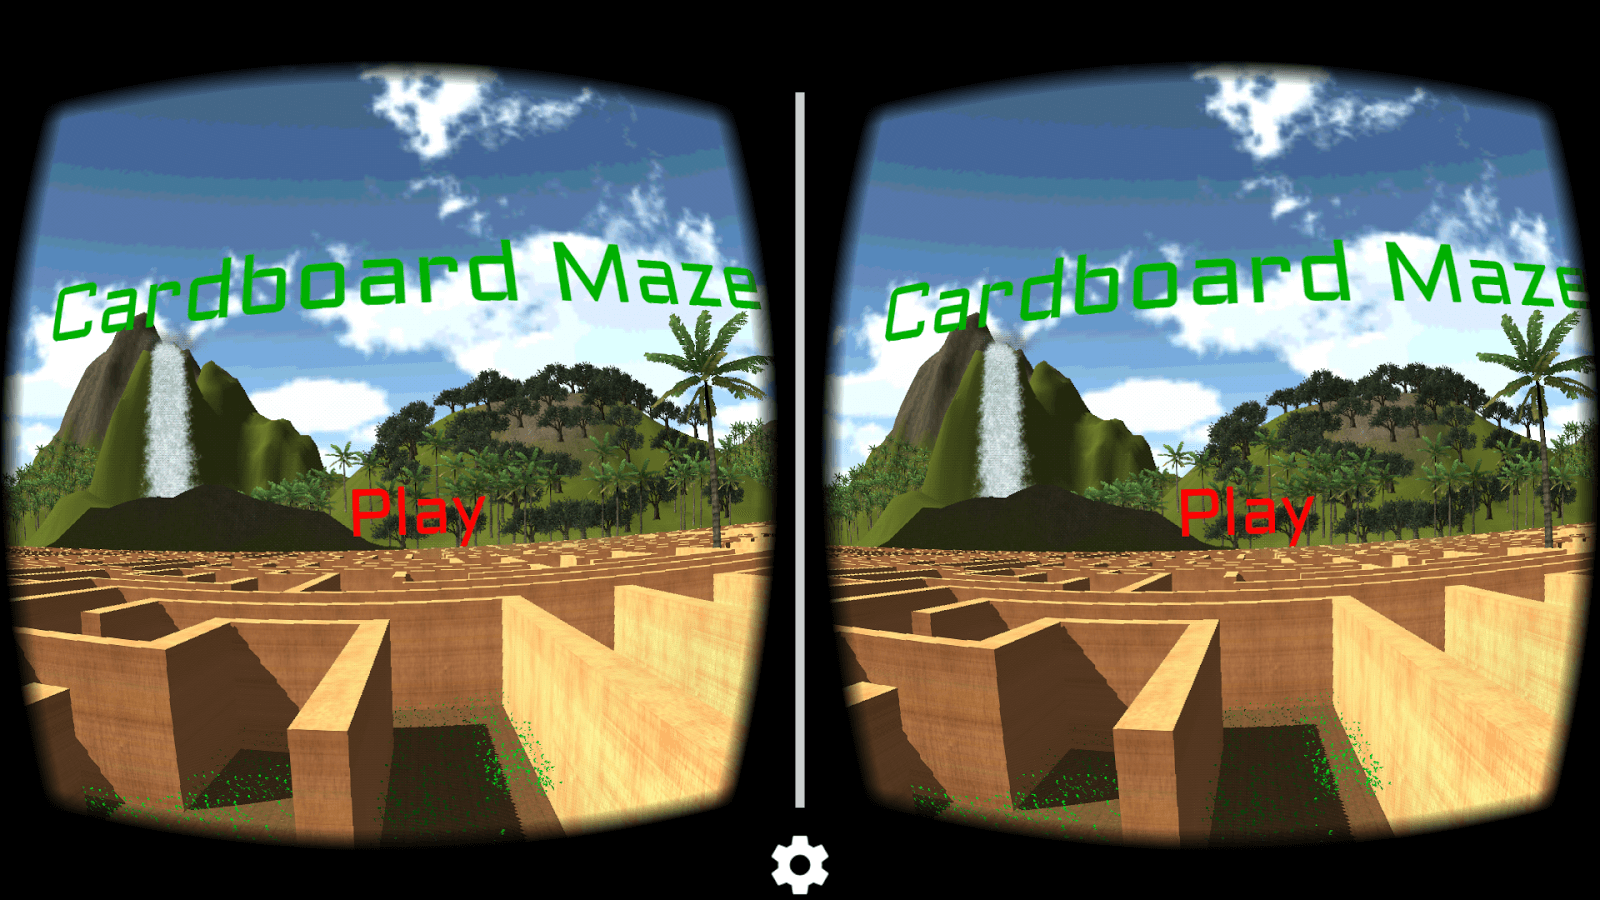 Maze Cardboard